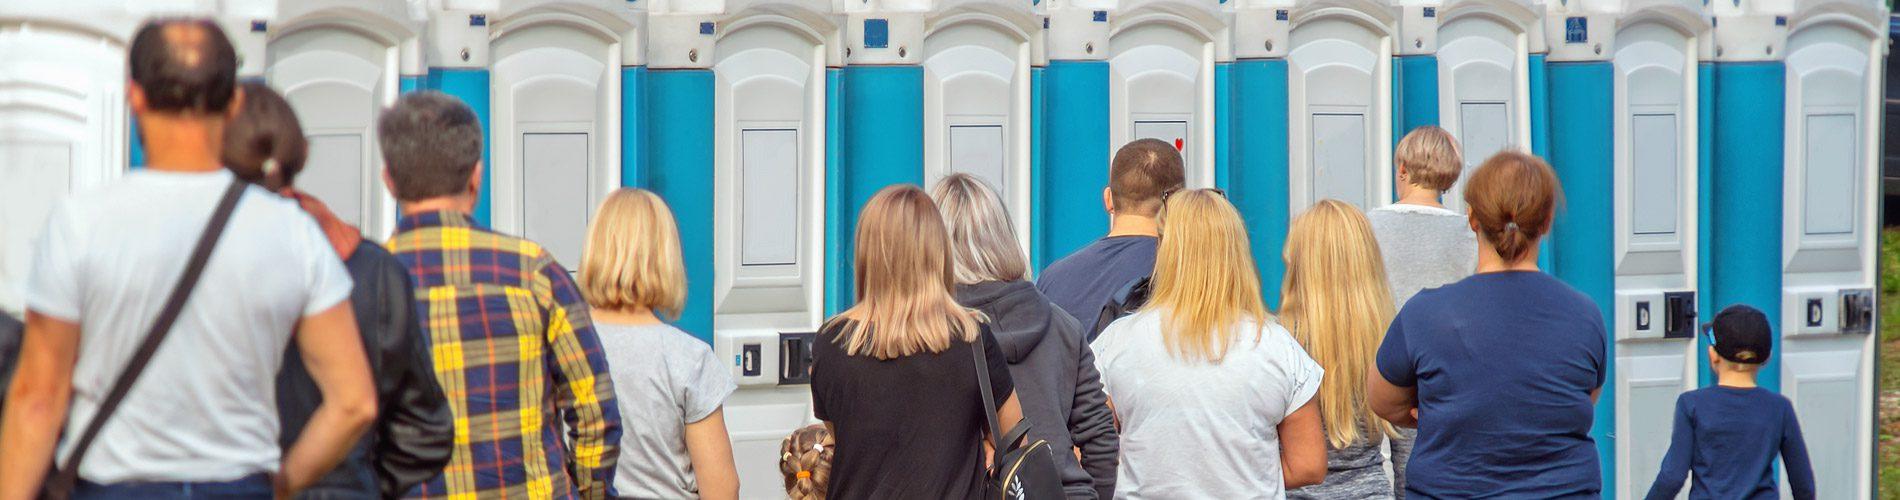 Portable Toilet Rental in Vandalia IL Area